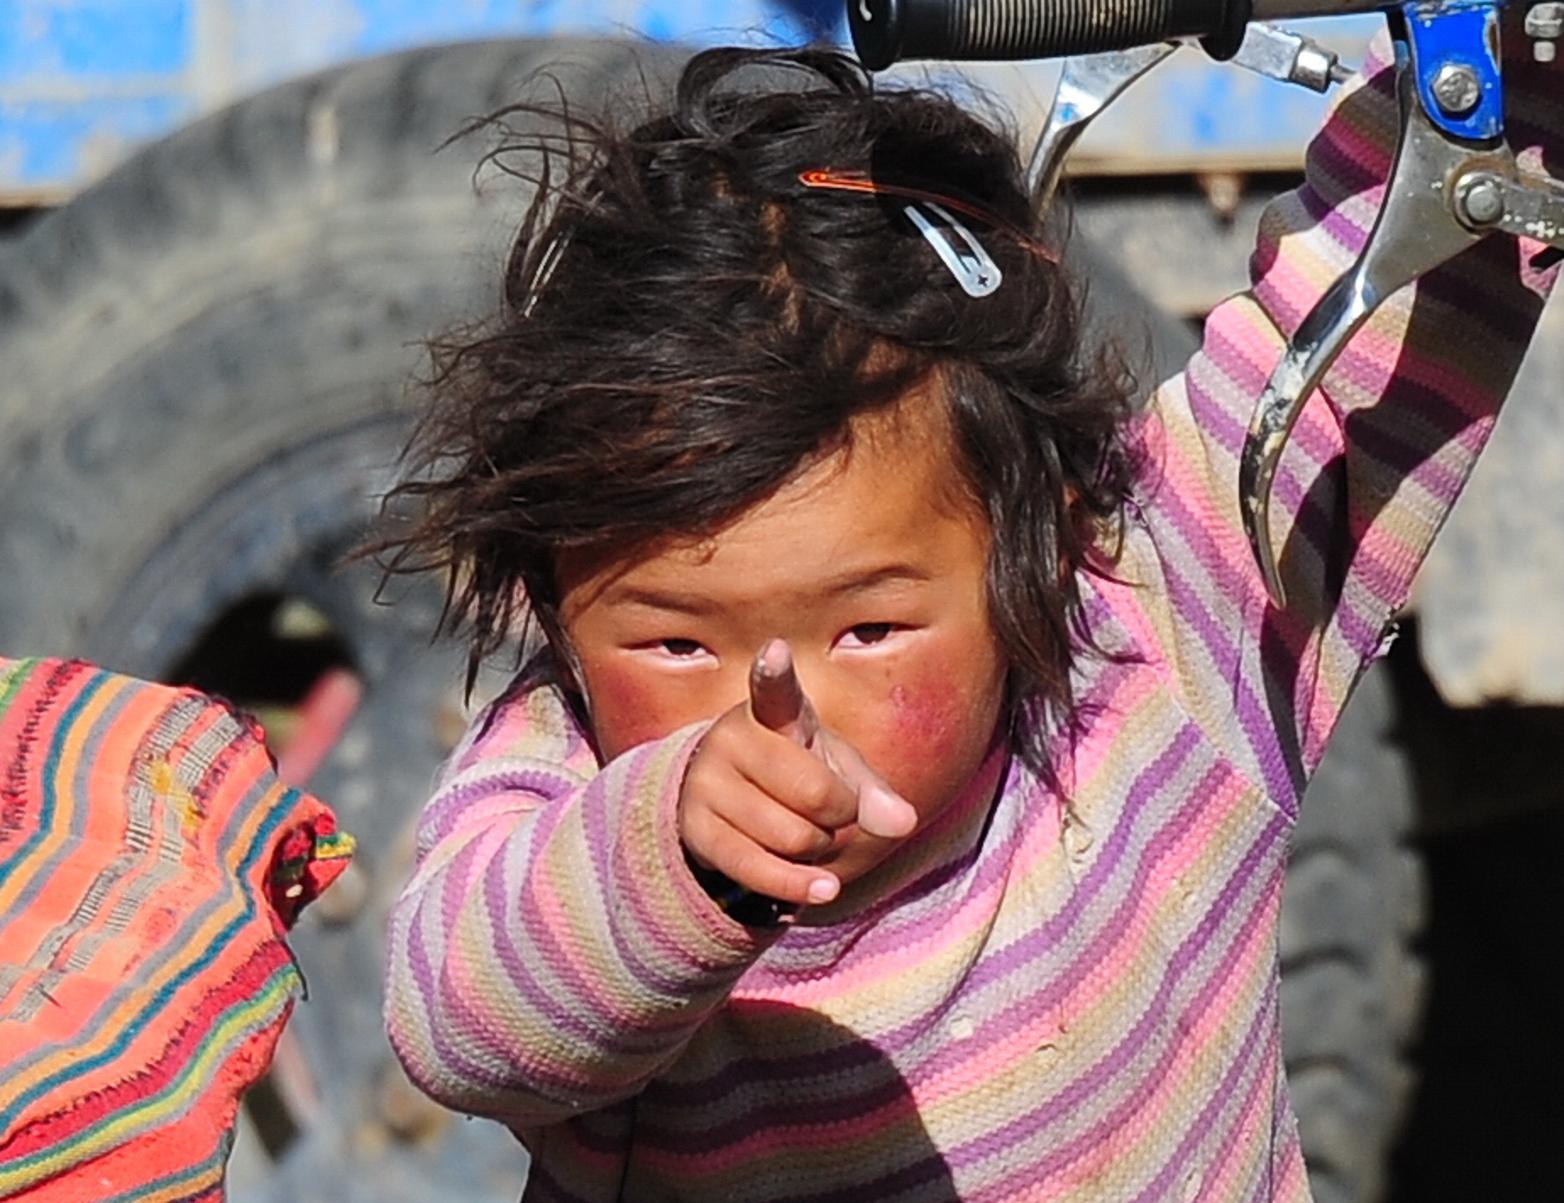 2017 Tibet Relief Fund raffle winners announced!